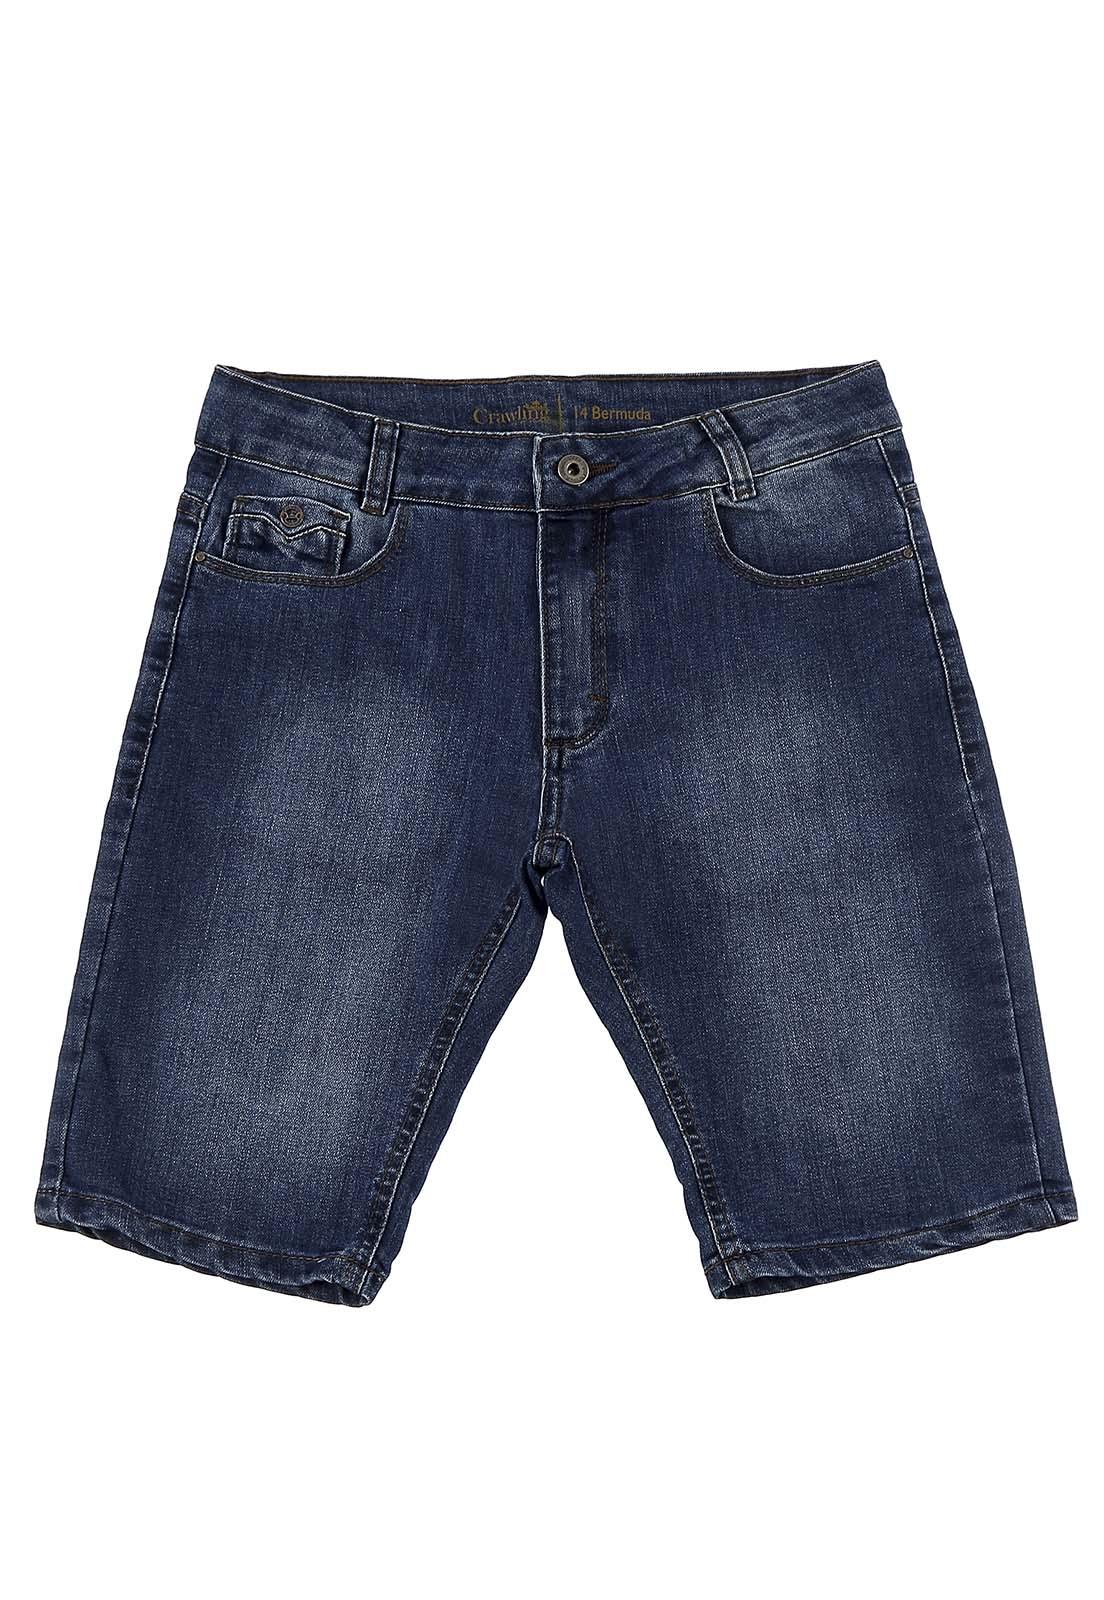 Bermuda Masculina Crawling Jeans Azul